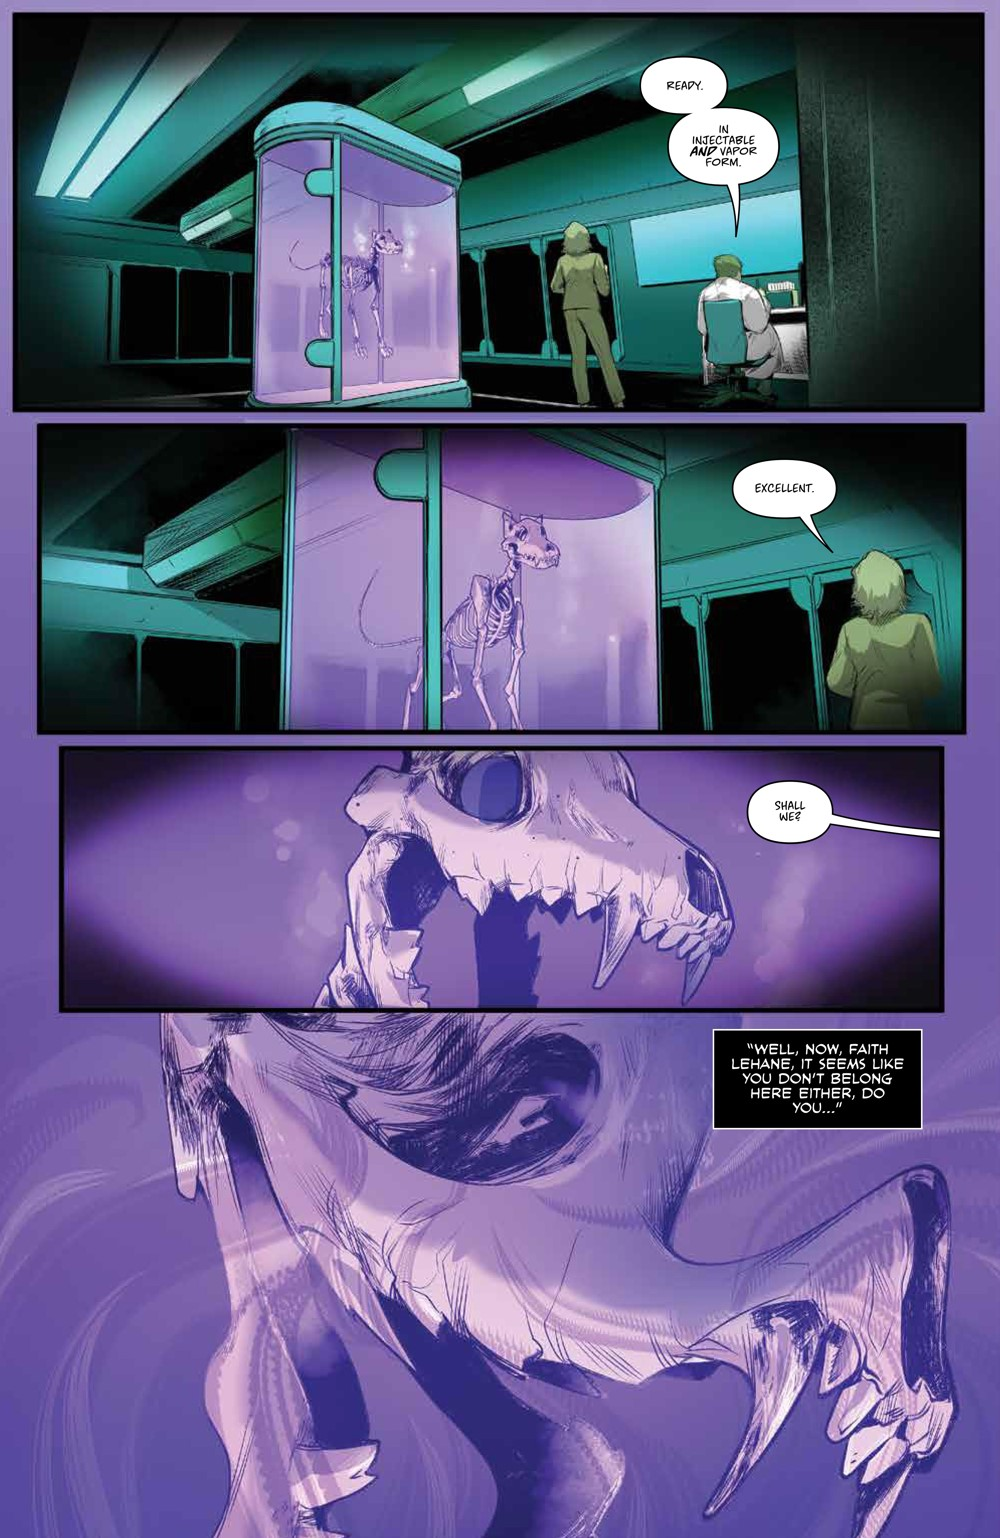 Buffy_028_PRESS_5 ComicList Previews: BUFFY THE VAMPIRE SLAYER #28